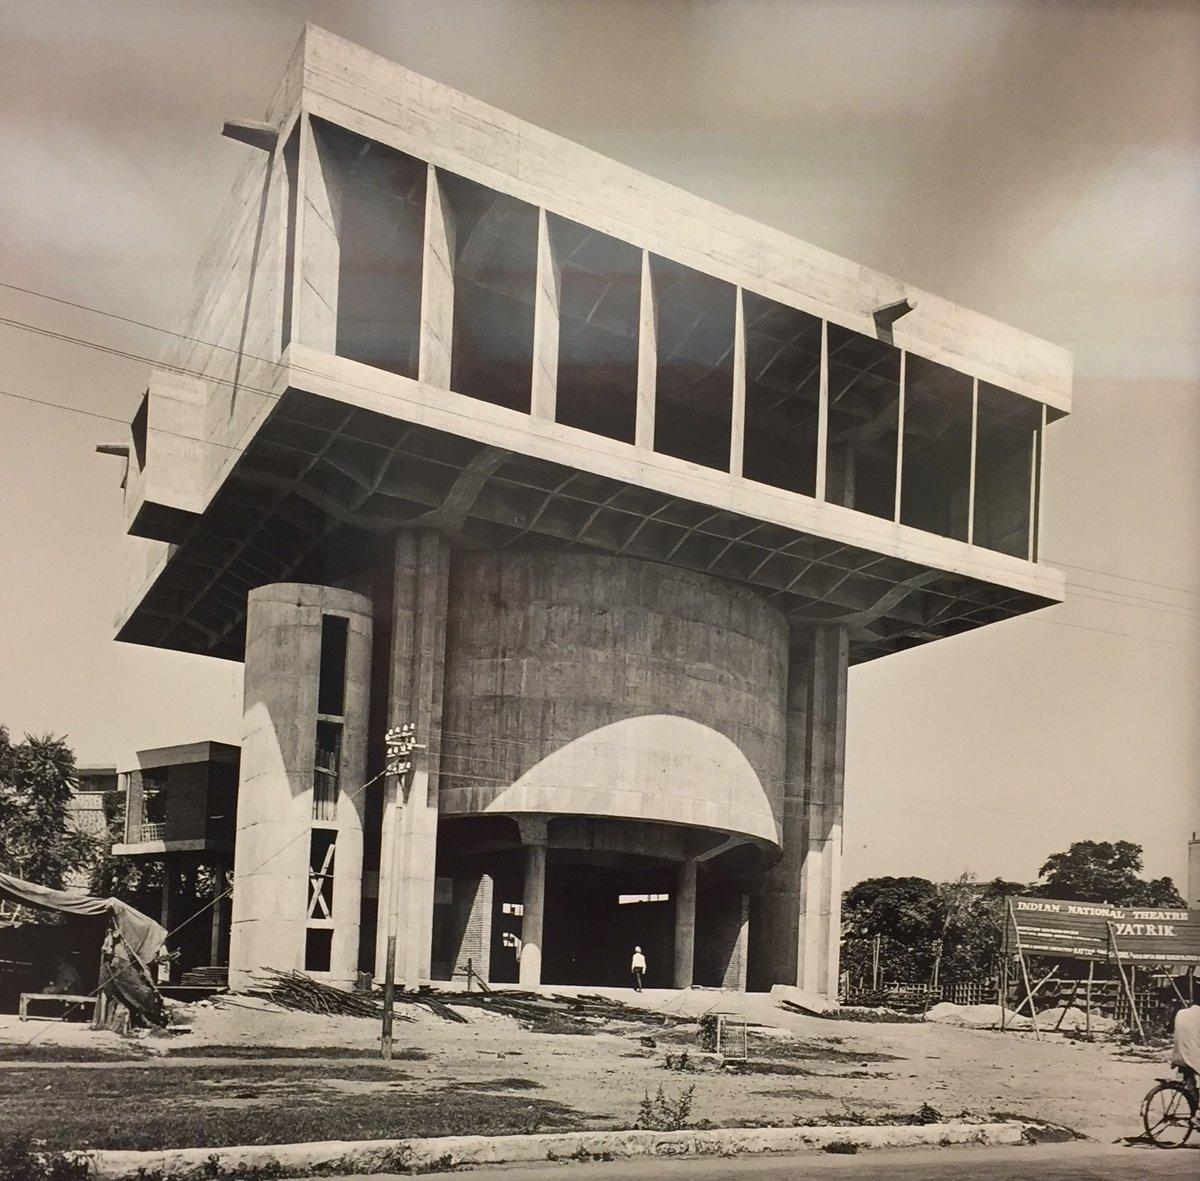 Matali Crasset On Twitter Dehli Kirannadarmuseuofart Building